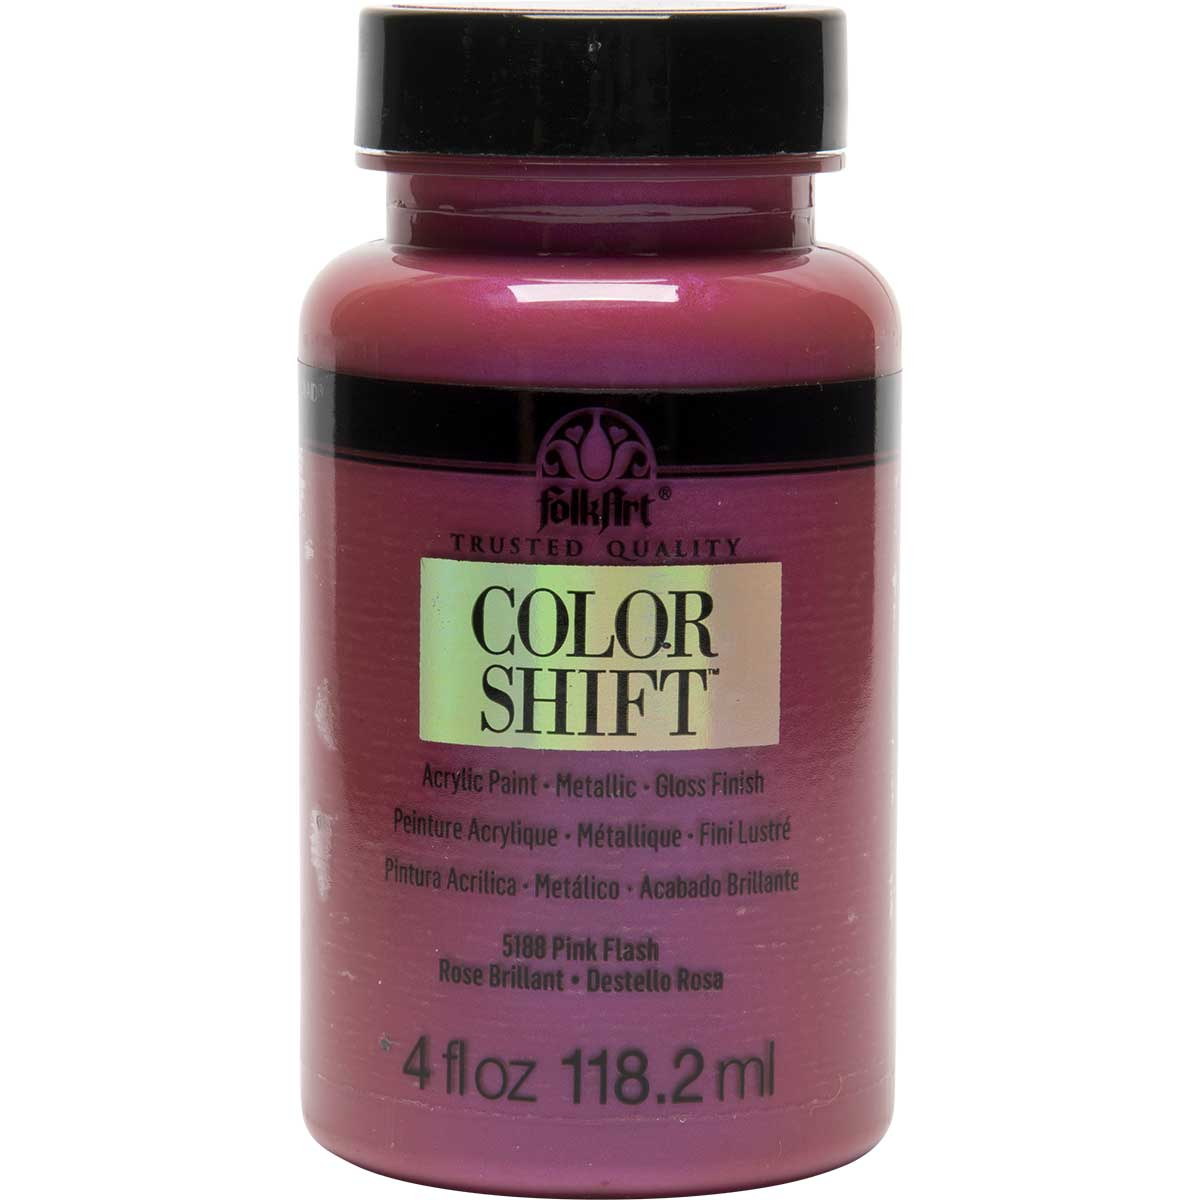 FolkArt ® Color Shift™ Acrylic Paint - Pink Flash, 4 oz. - 5188